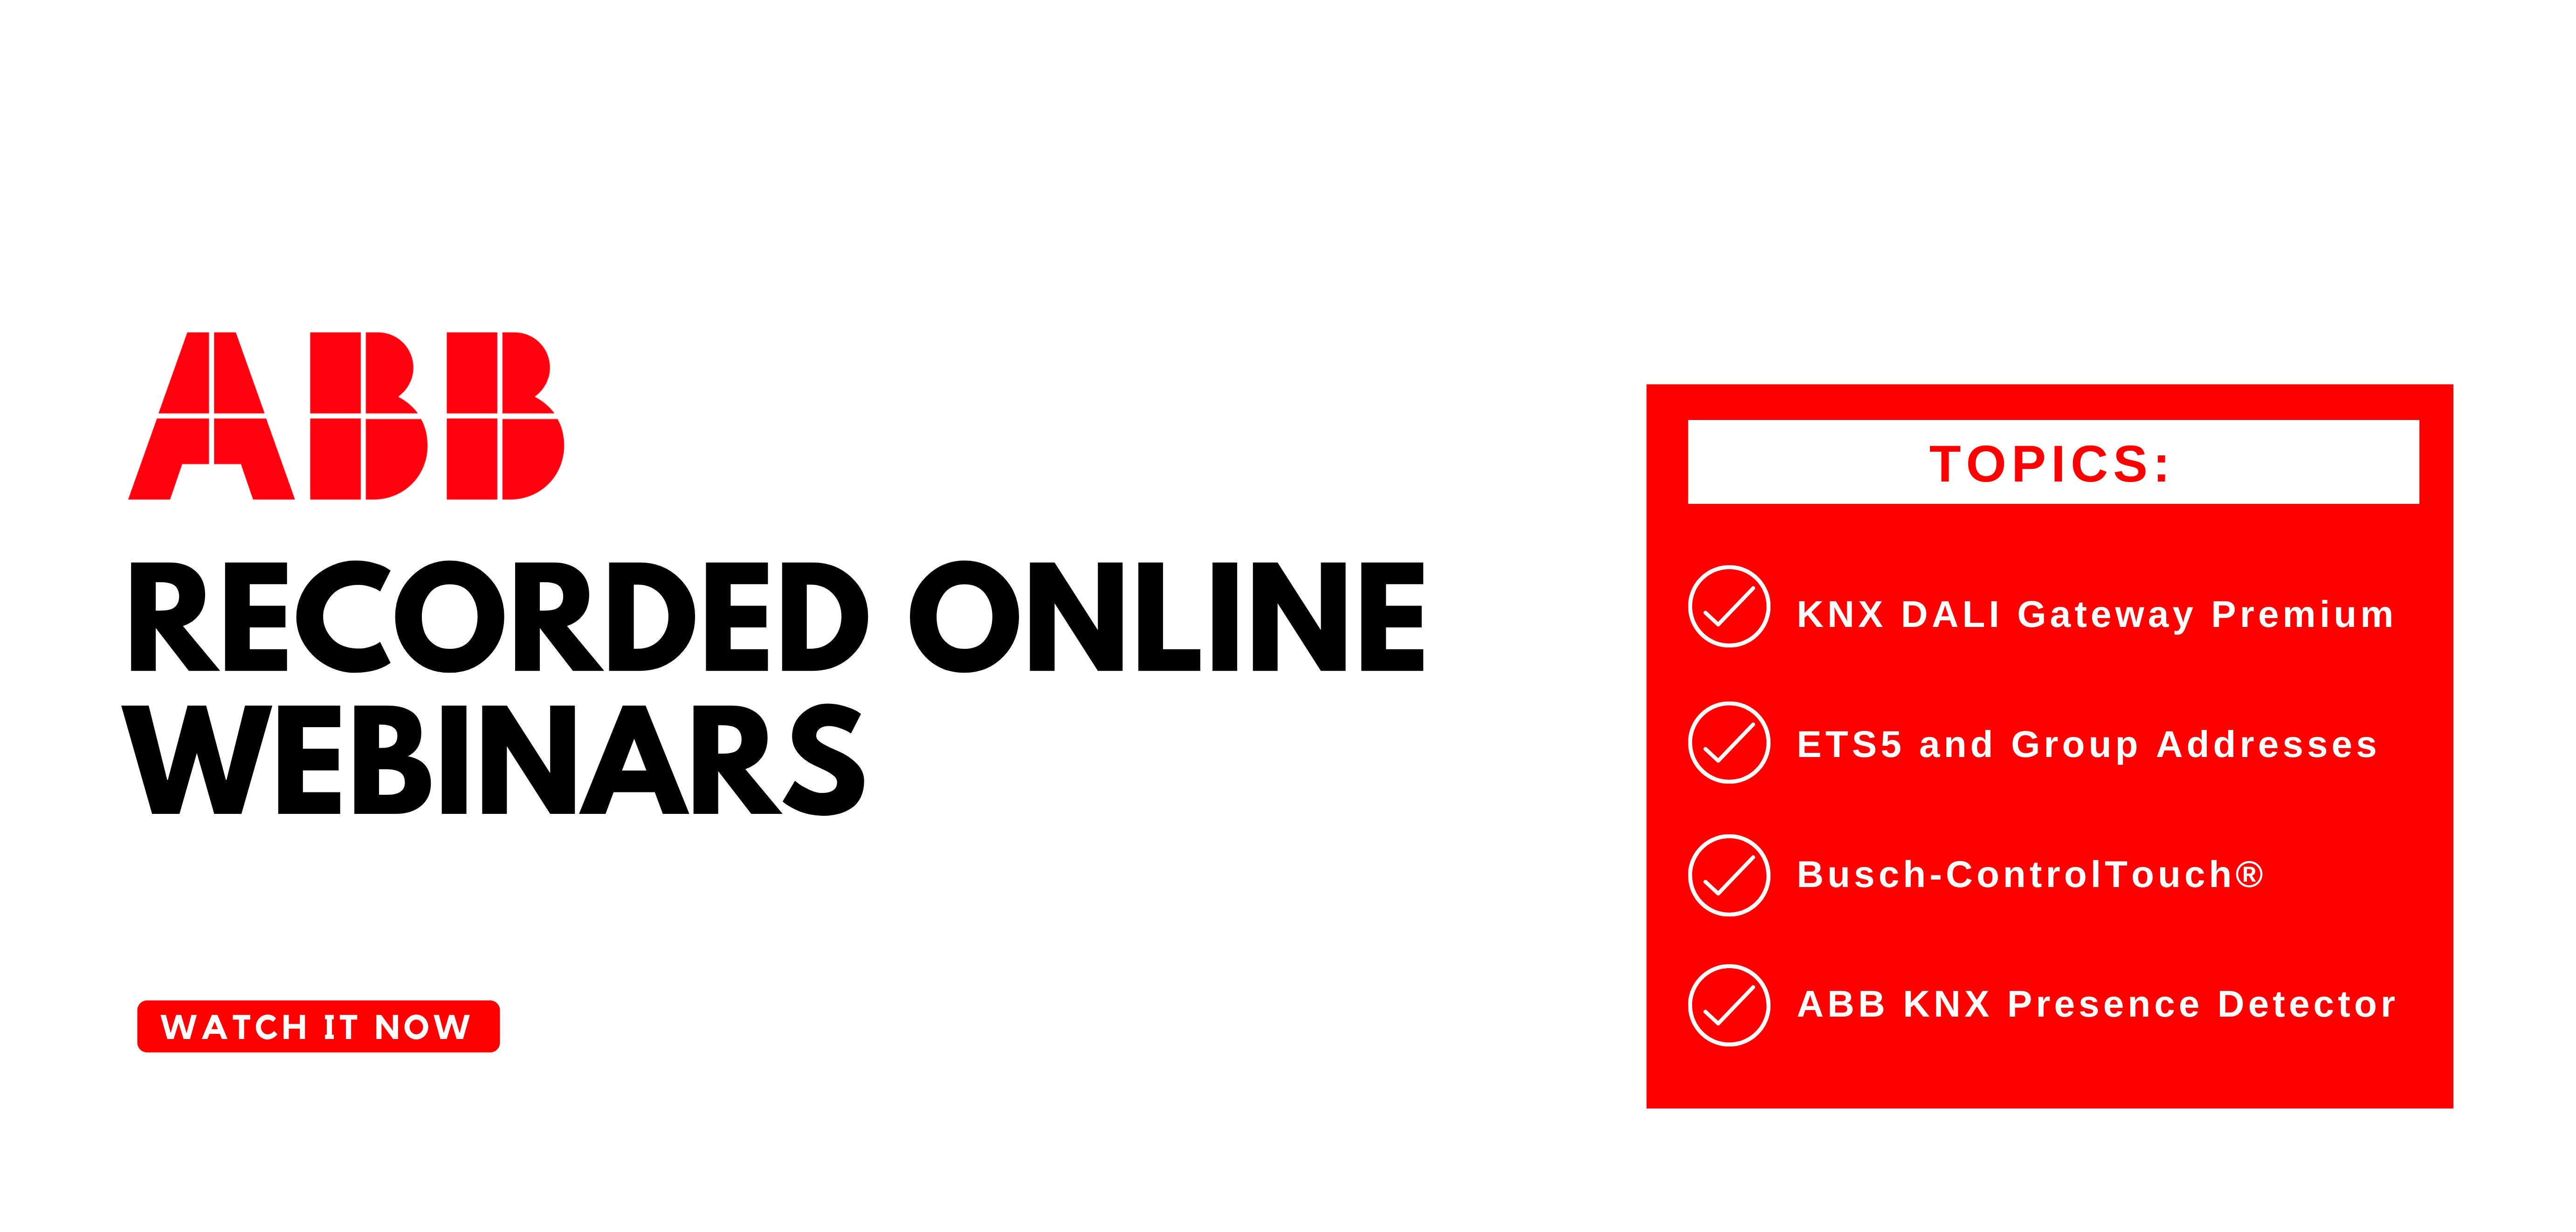 ABB record online webinars